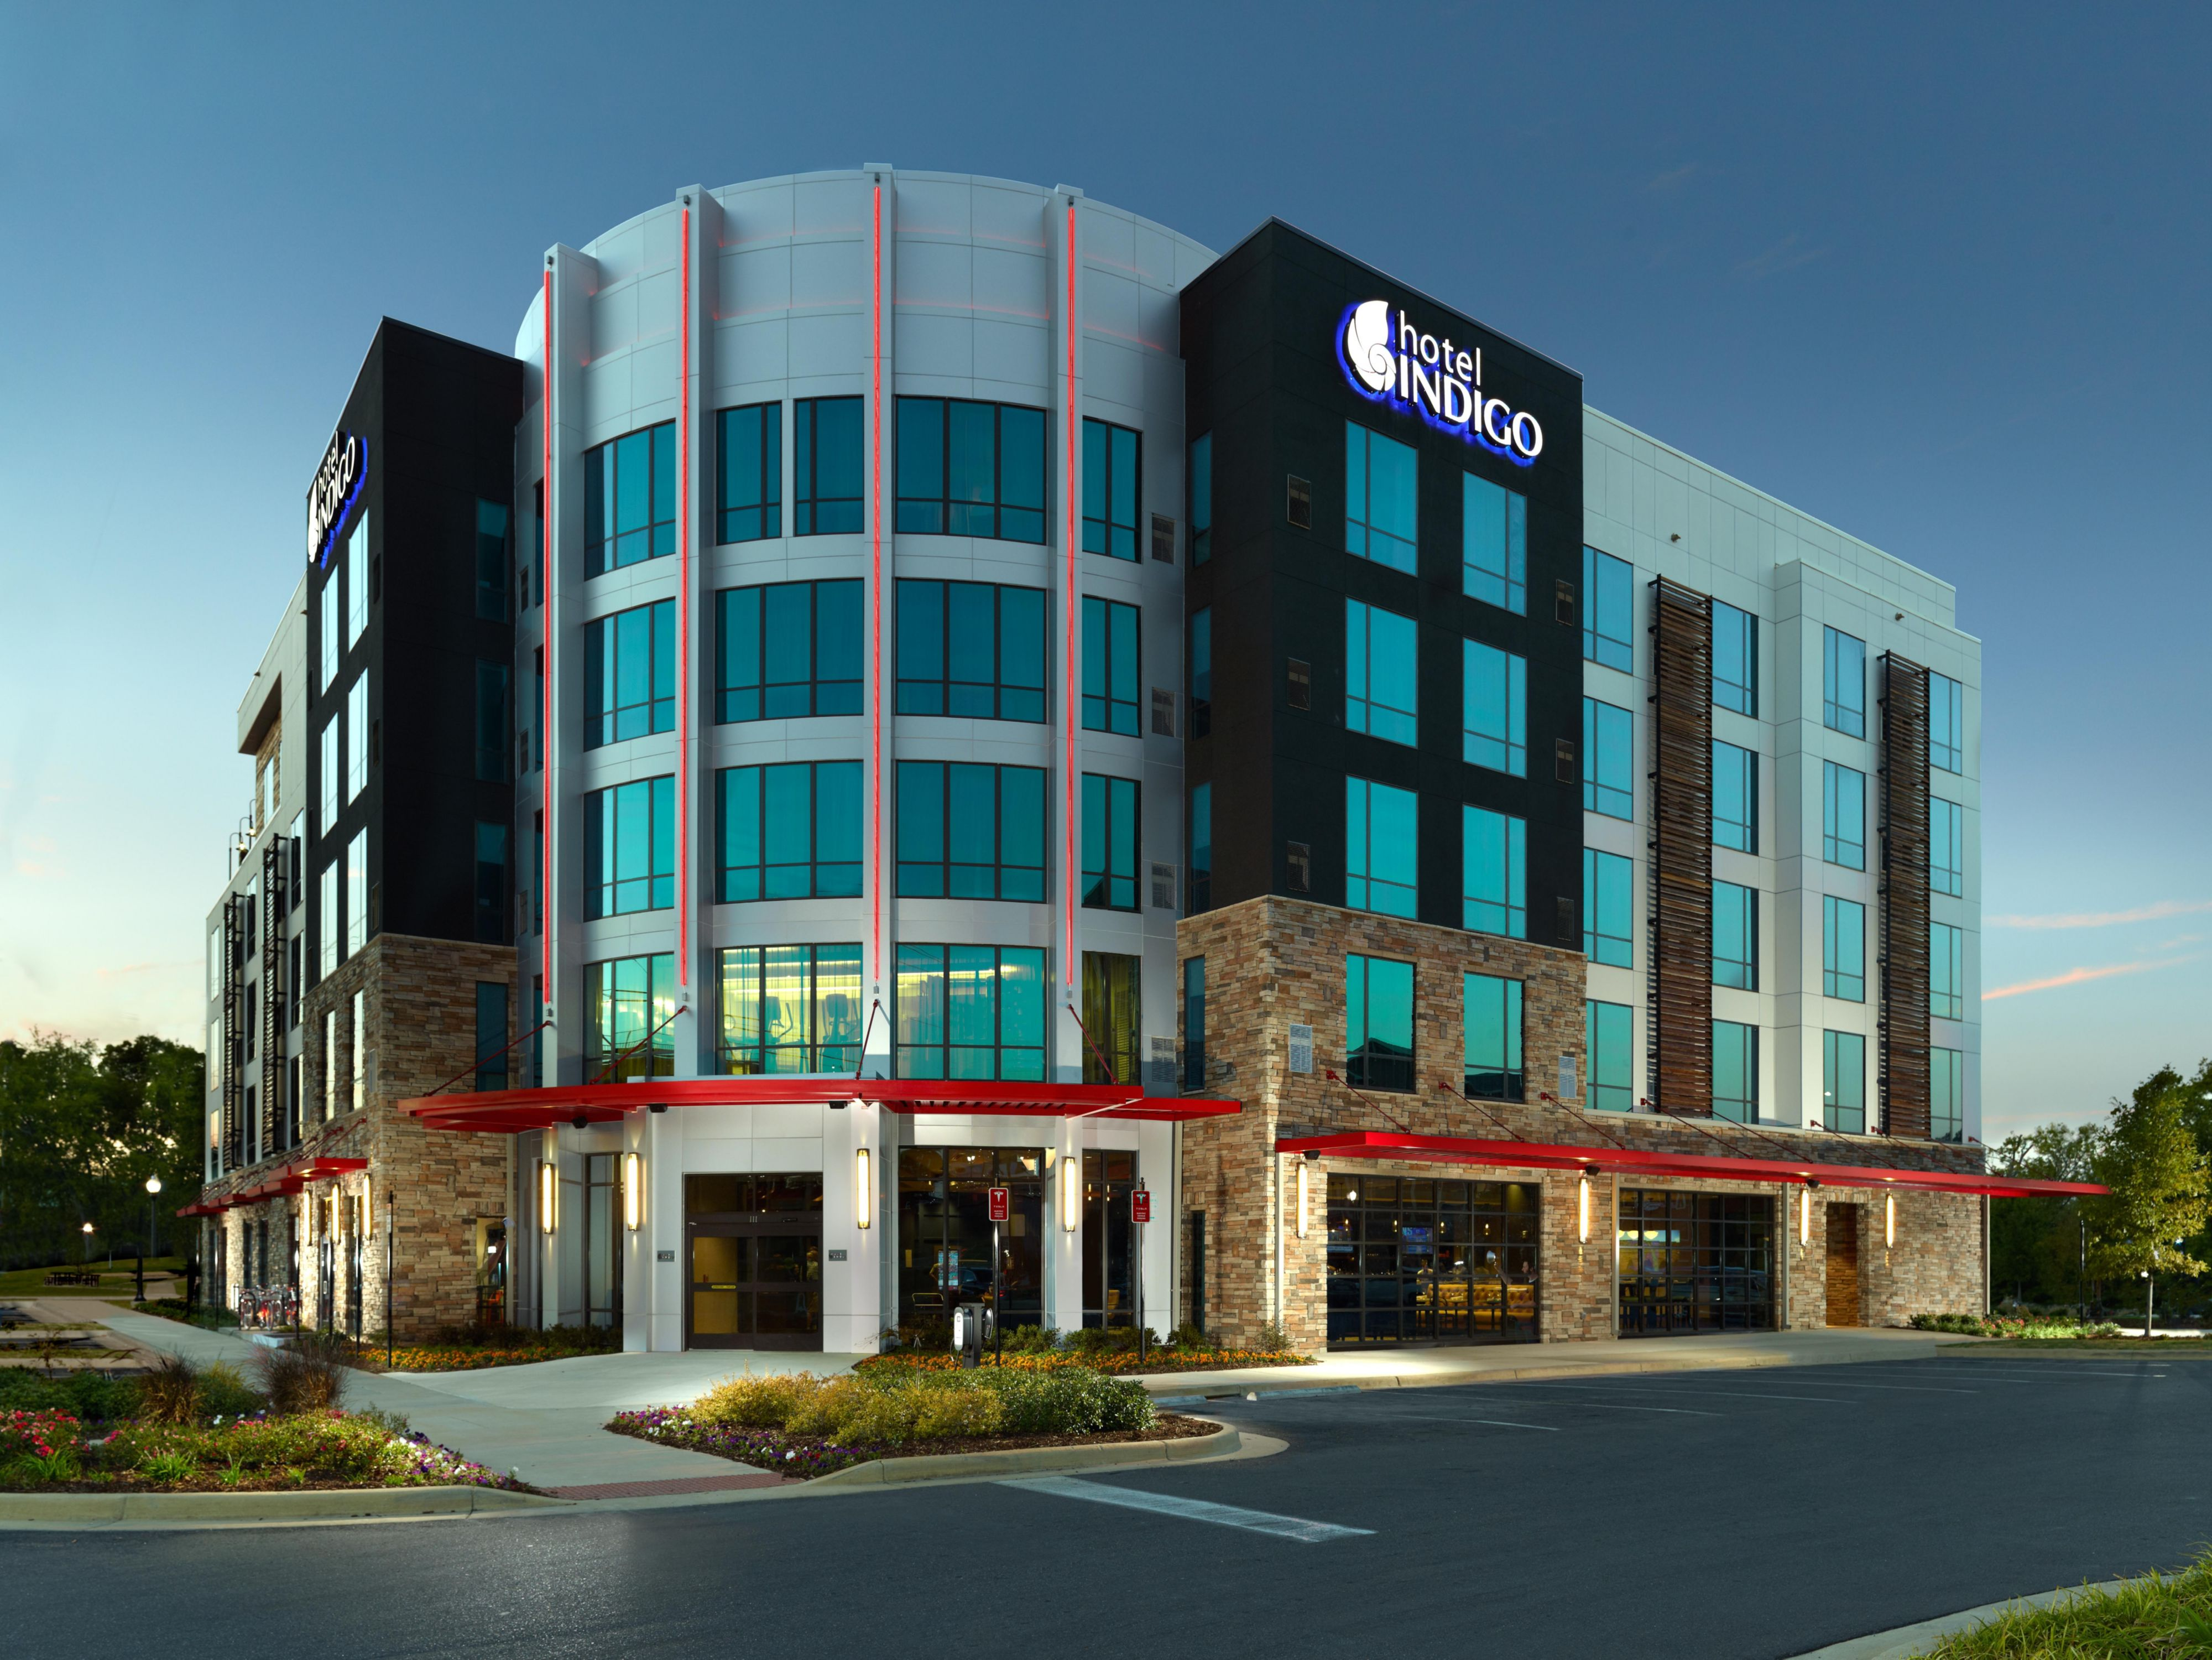 Hotels Downtown Tuscaloosa